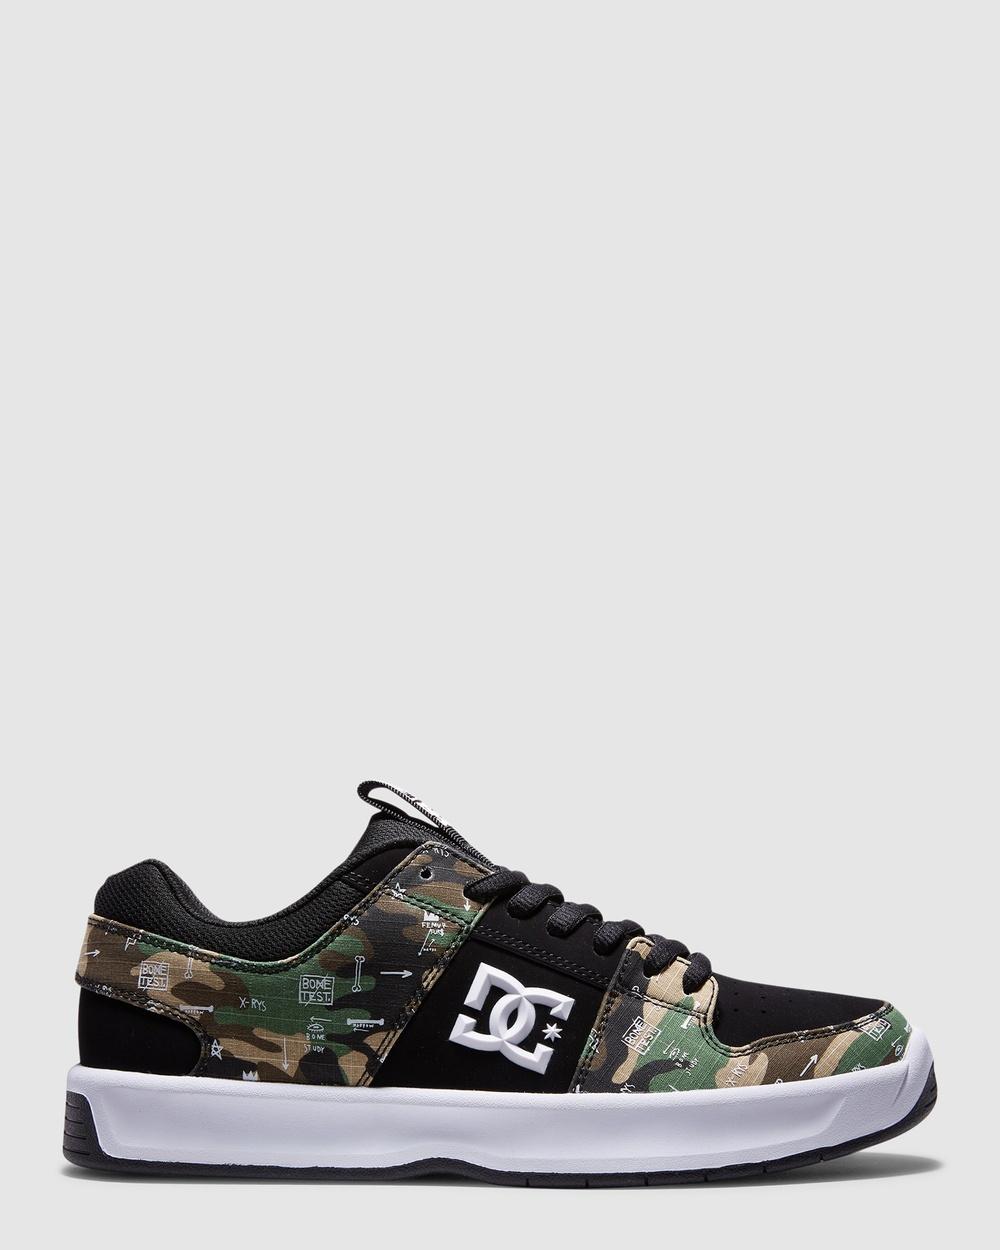 DC Shoes Mens BASQ Lynx Zero Shoe Sneakers Black/Camo Print